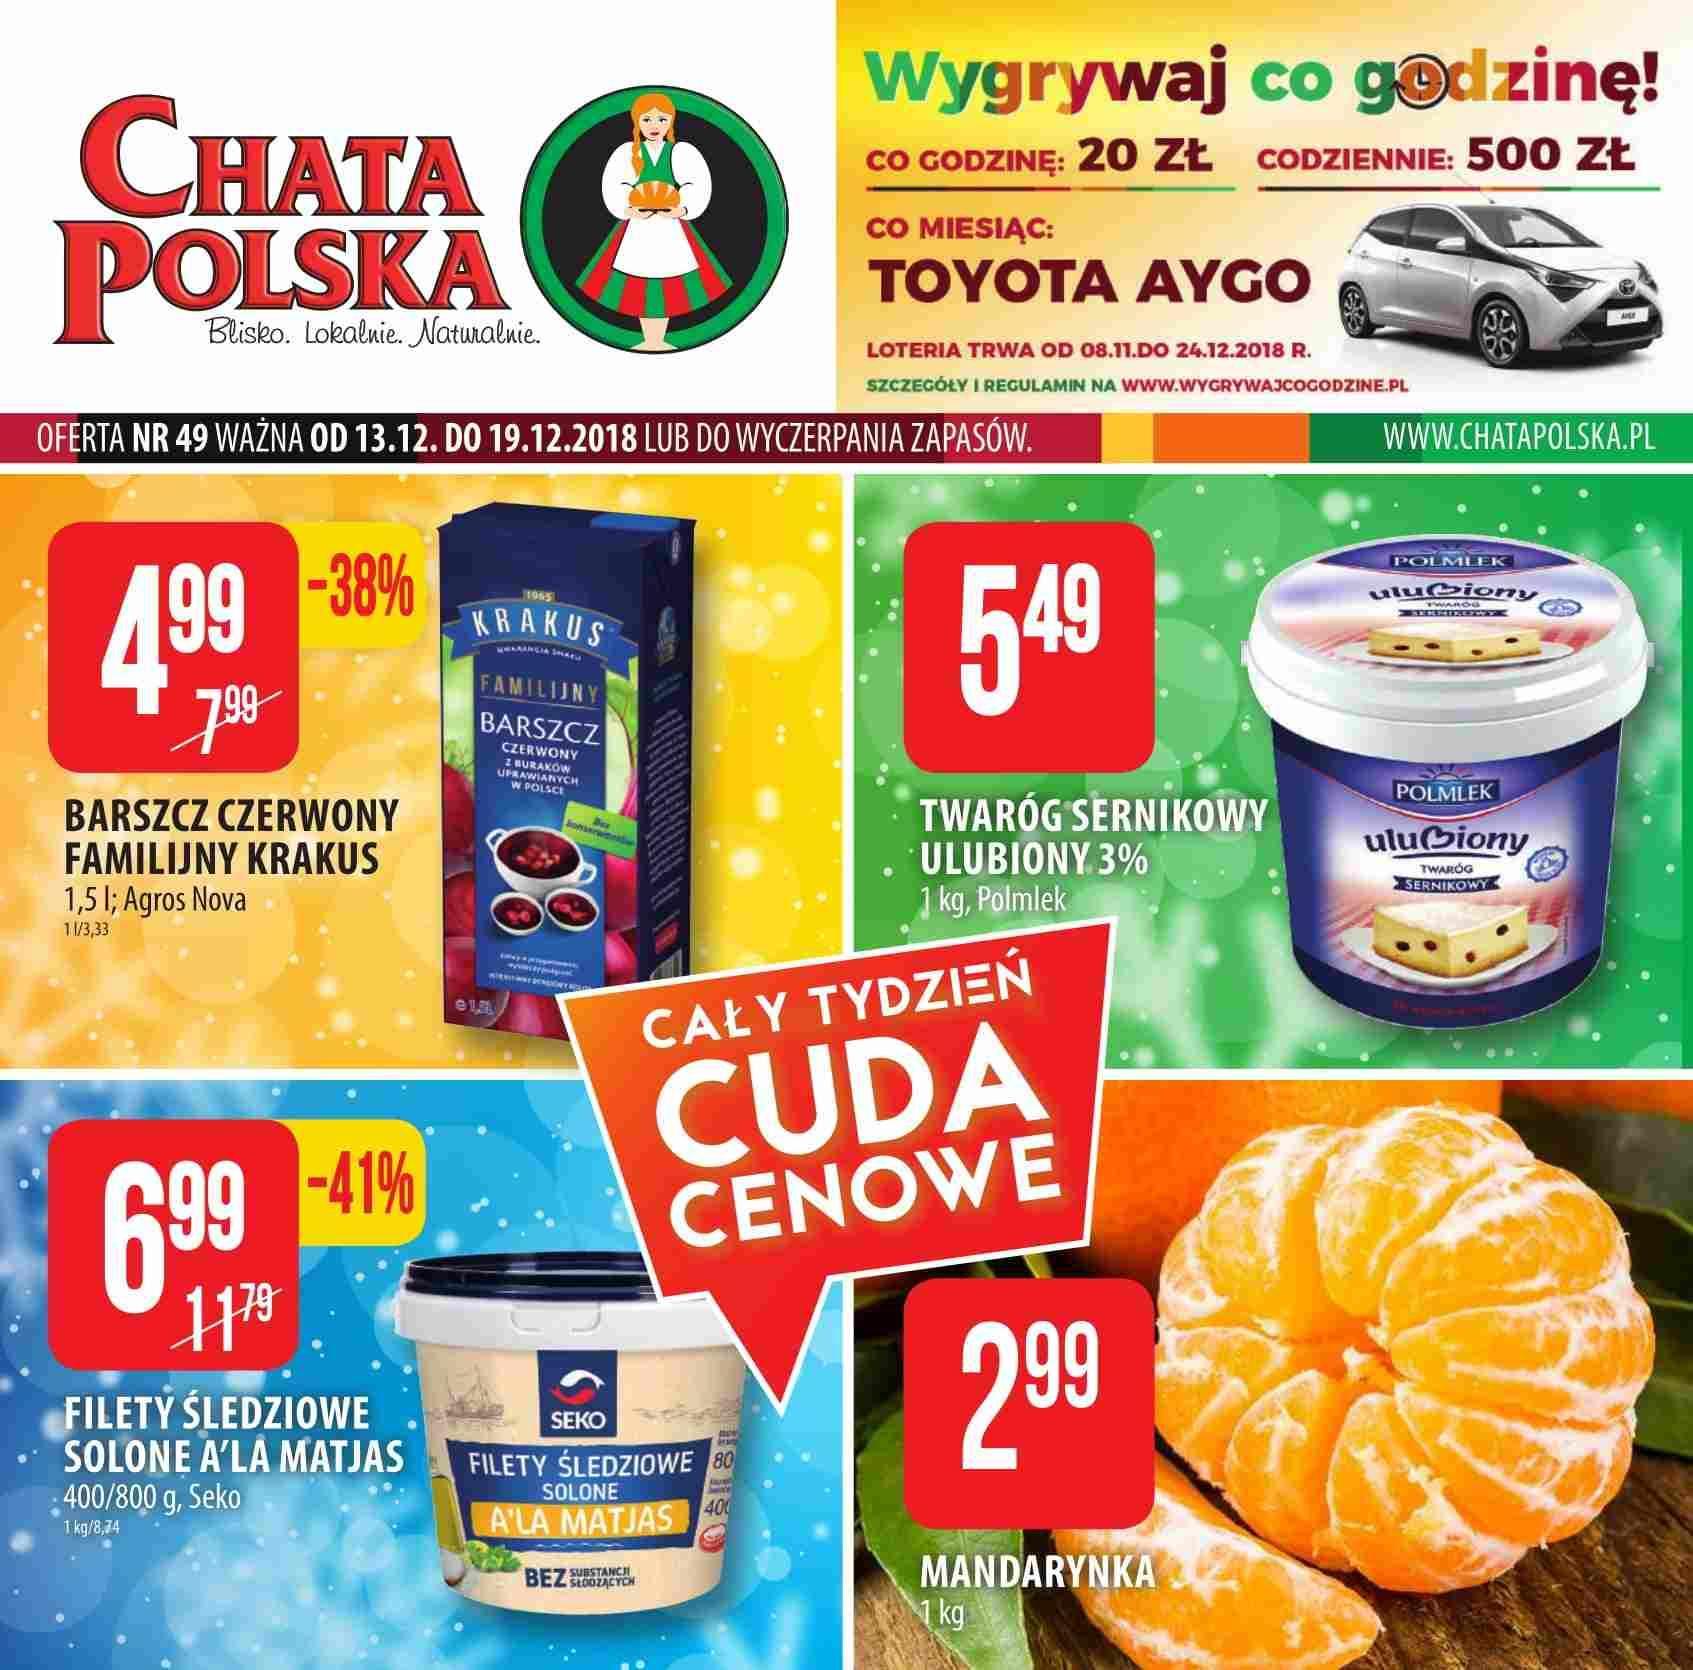 Gazetka promocyjna Chata Polska do 19/12/2018 str.1